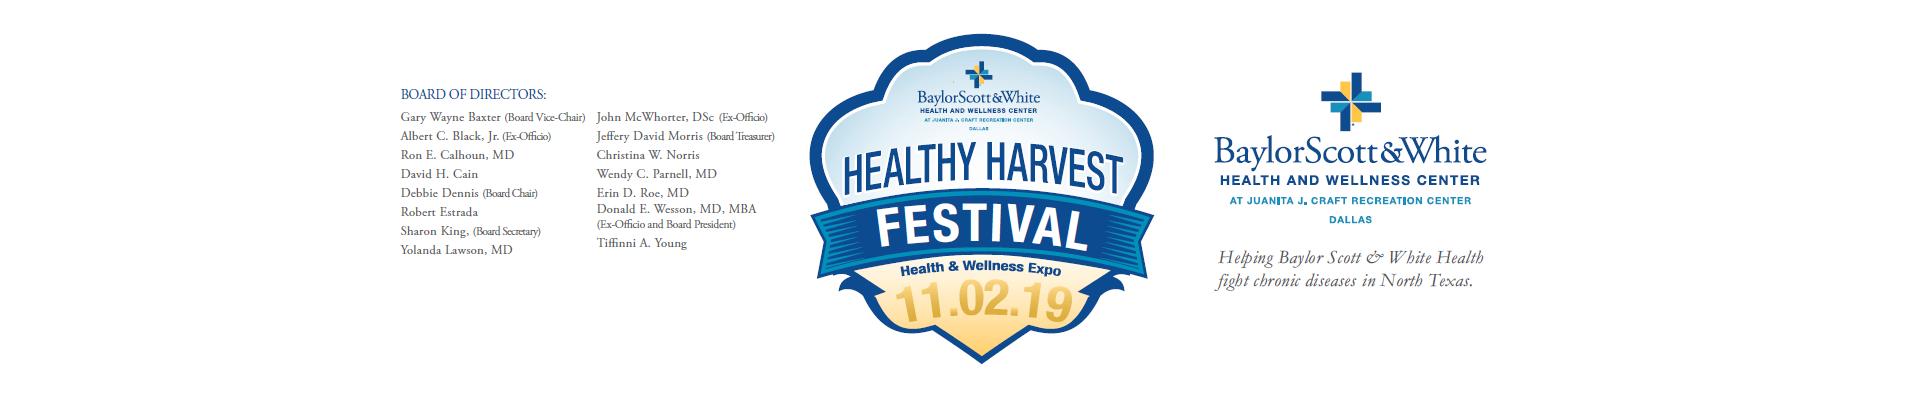 Healthy Harvest Festival 11.02.19